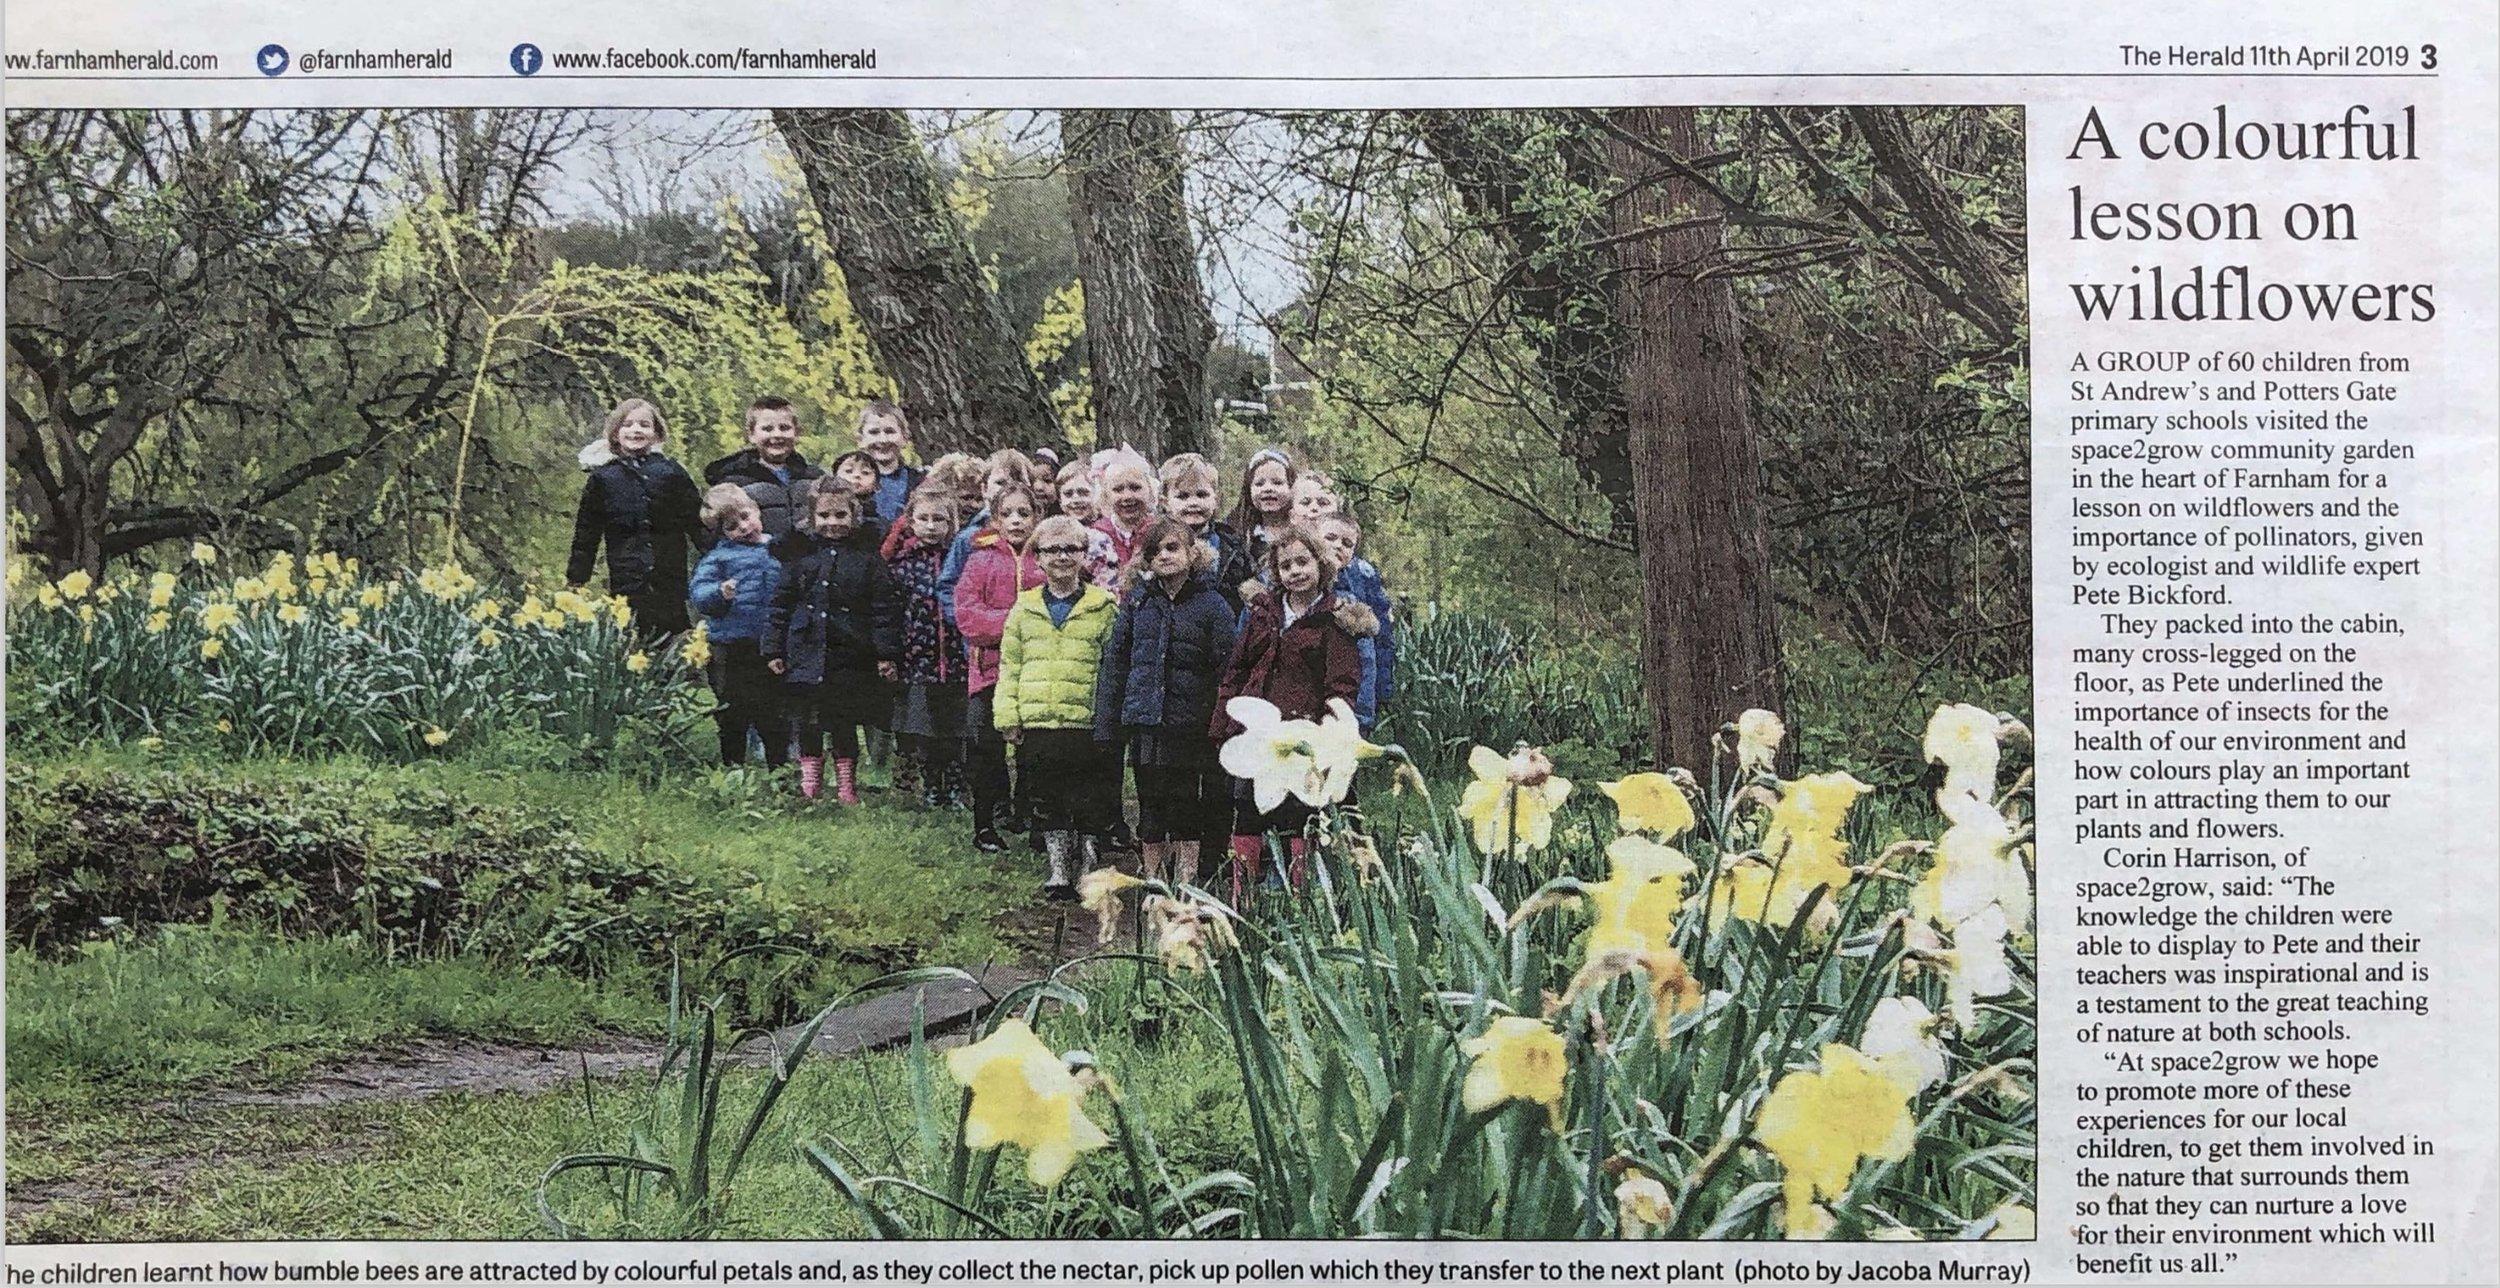 s2g Children Visit - Herald Article - 11.04.19.jpg